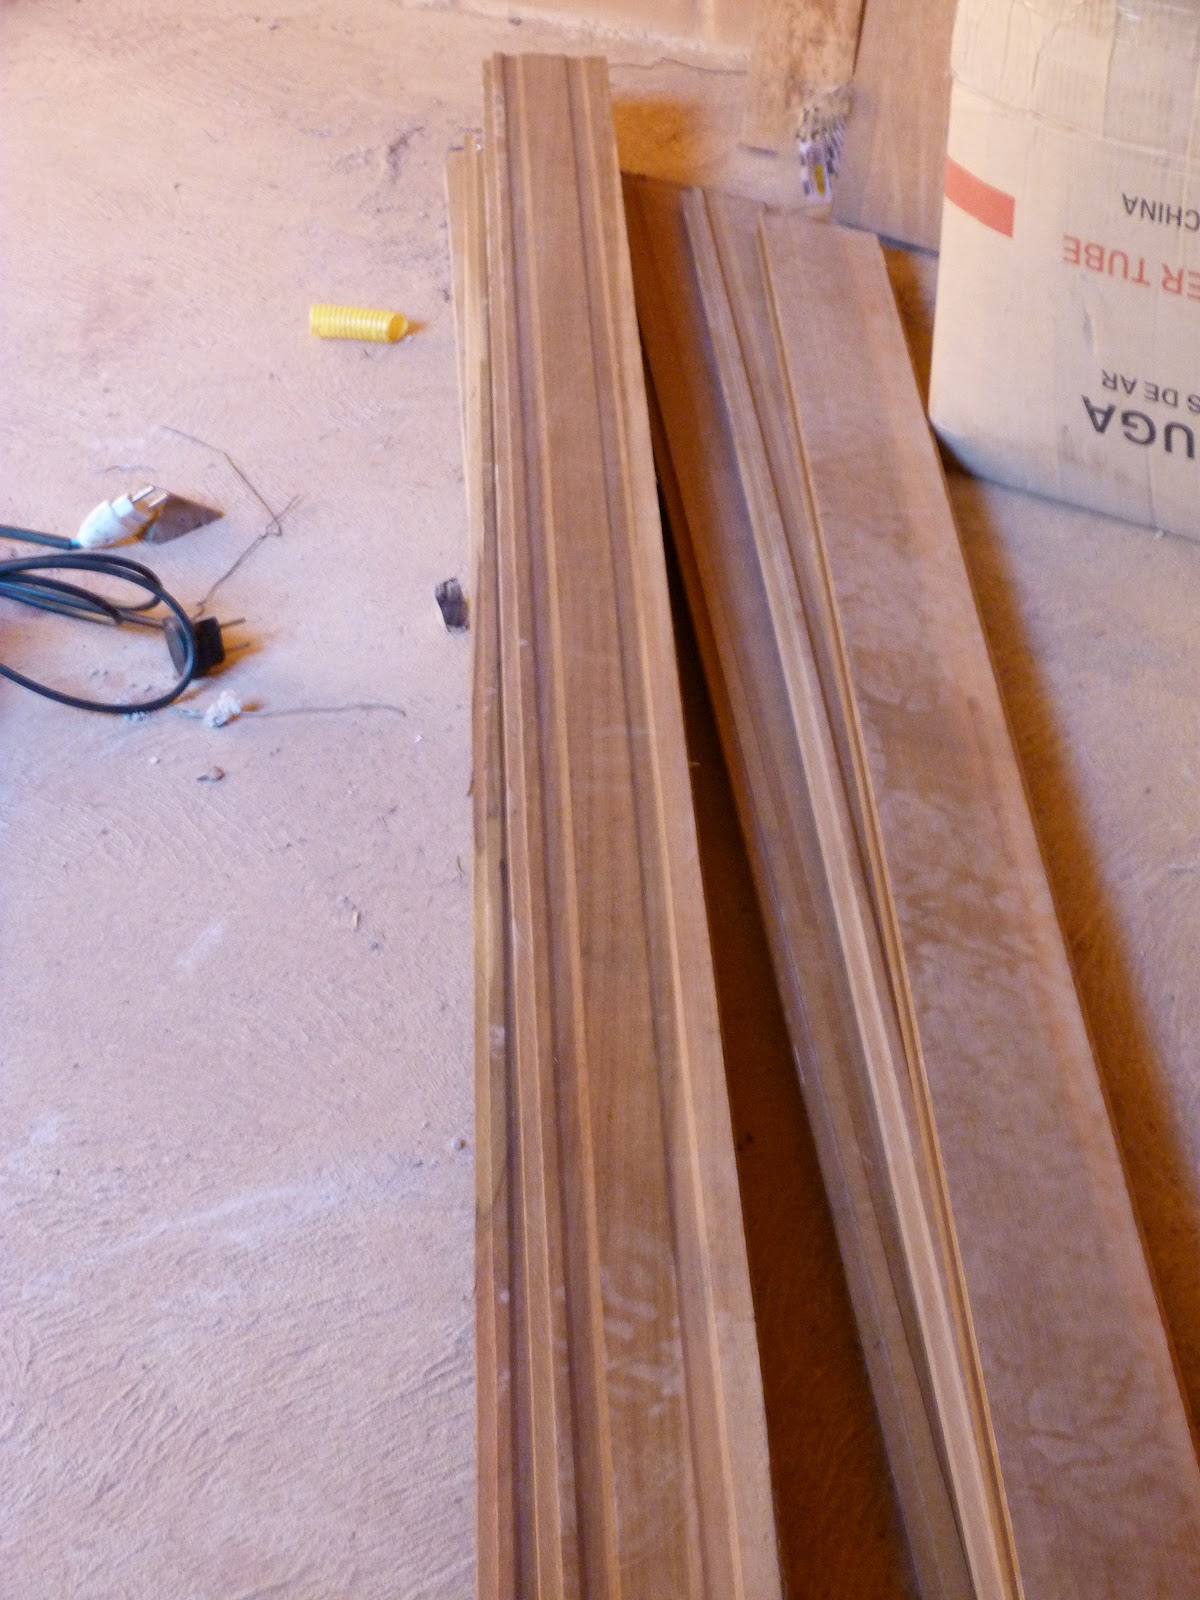 #441705 Feita de Bem: Portas e Janelas 1706 Janela De Aluminio Na Leroy Merlin